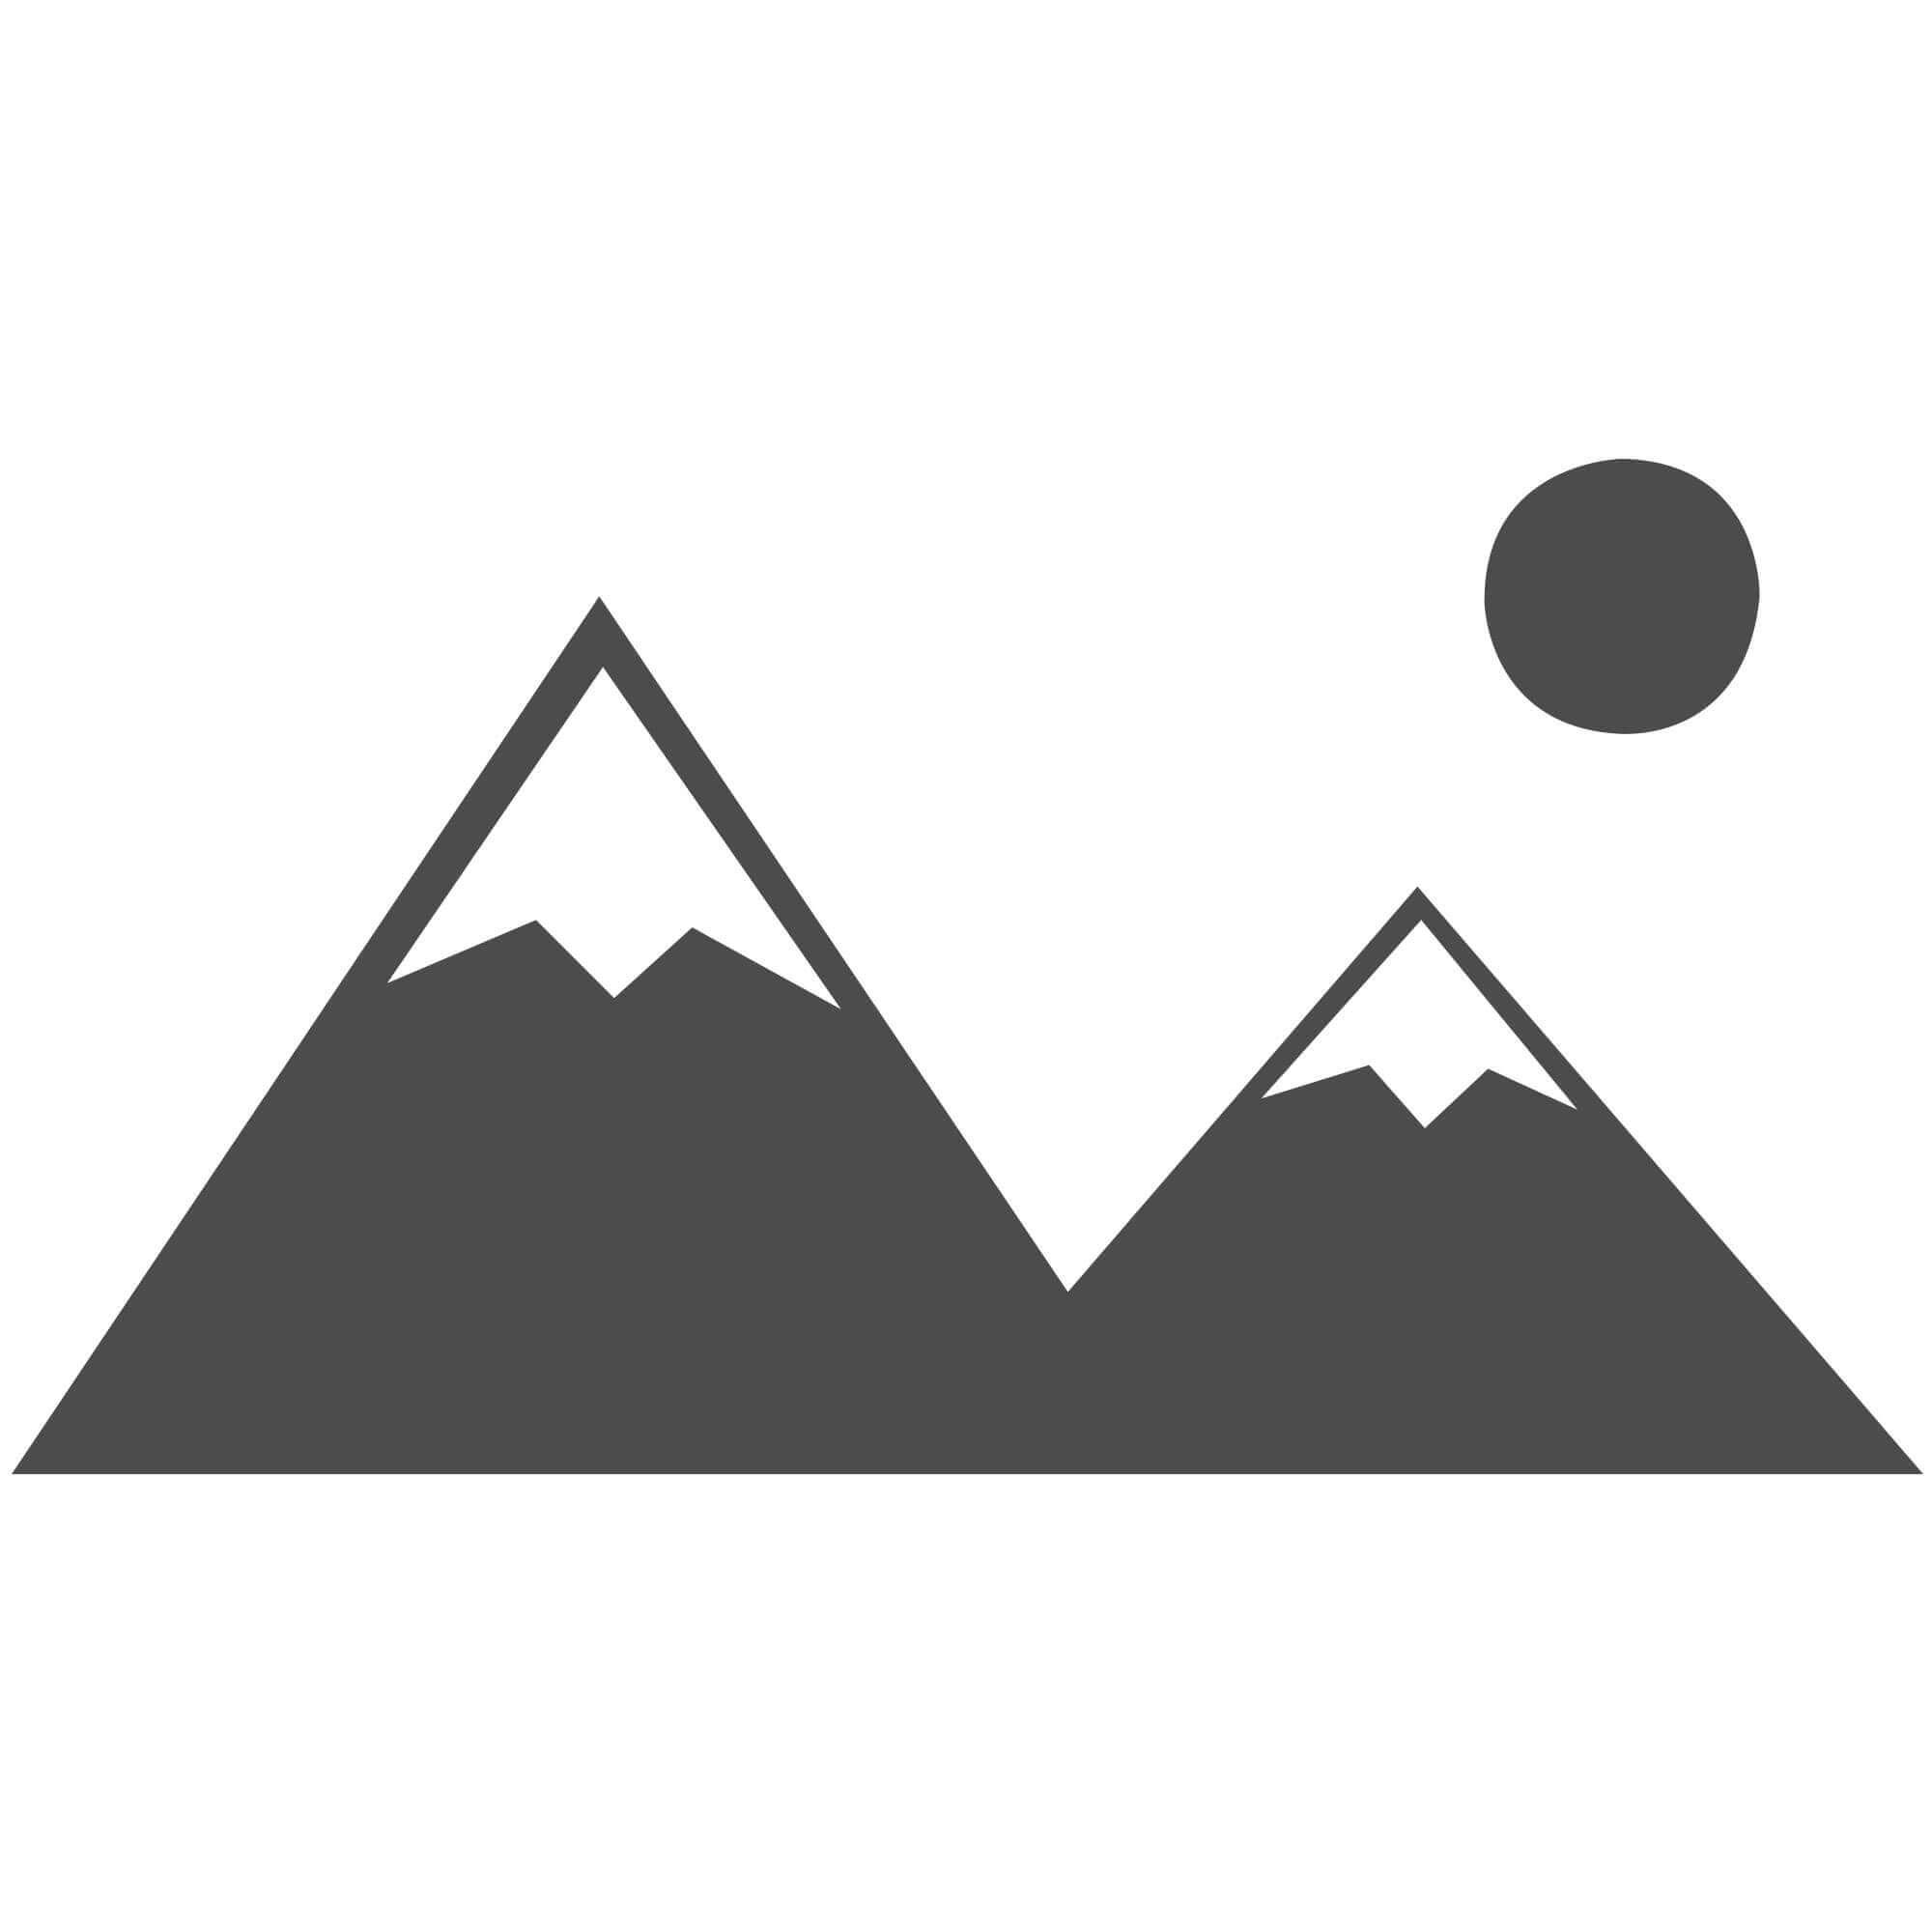 "Barada Damascus Rug - Grey - Size 80 x 150 cm (2'8"" x 5')"